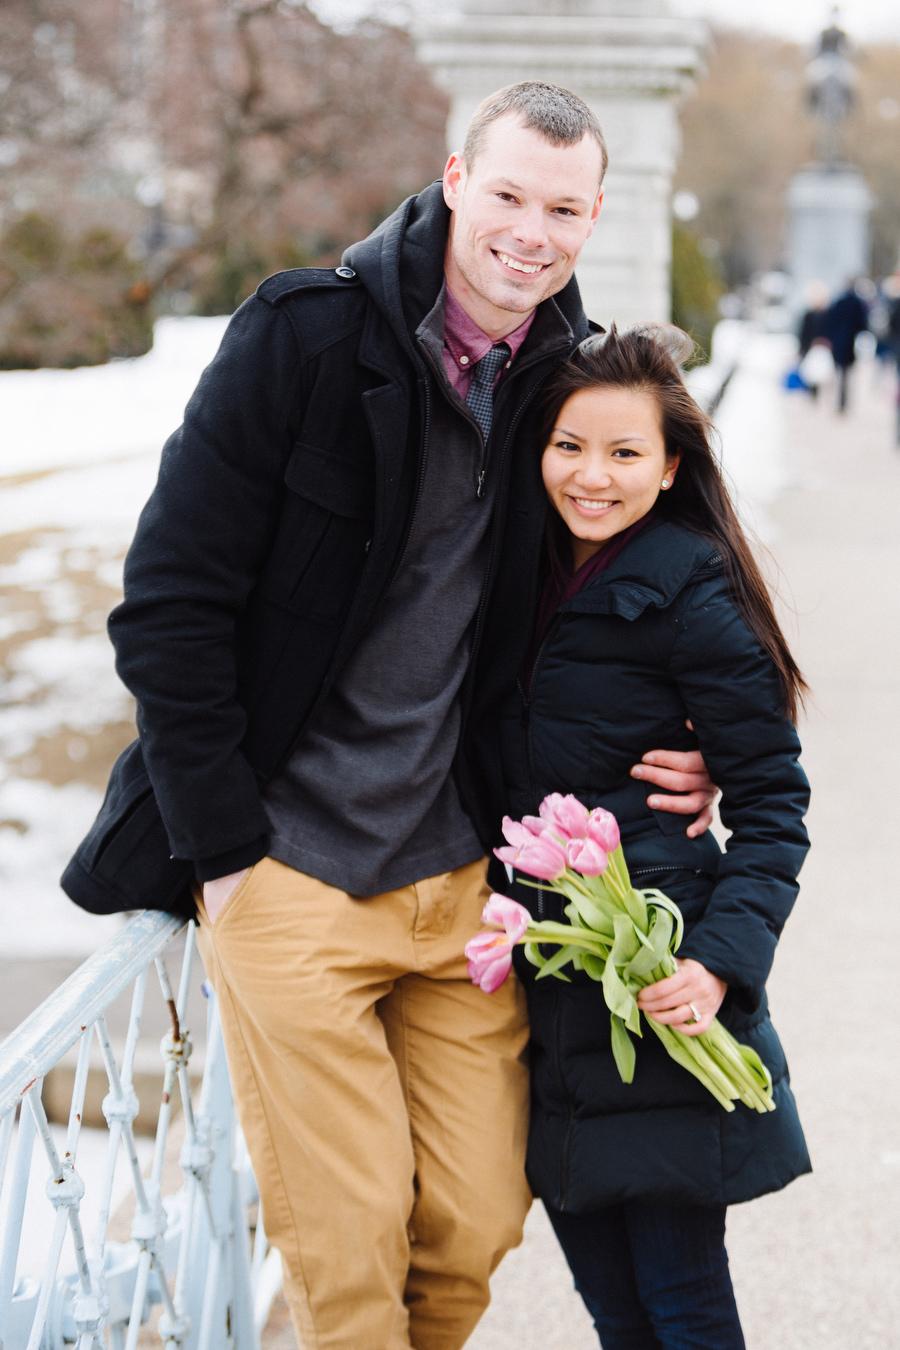 Boston public gardens proposal she said yes (13)